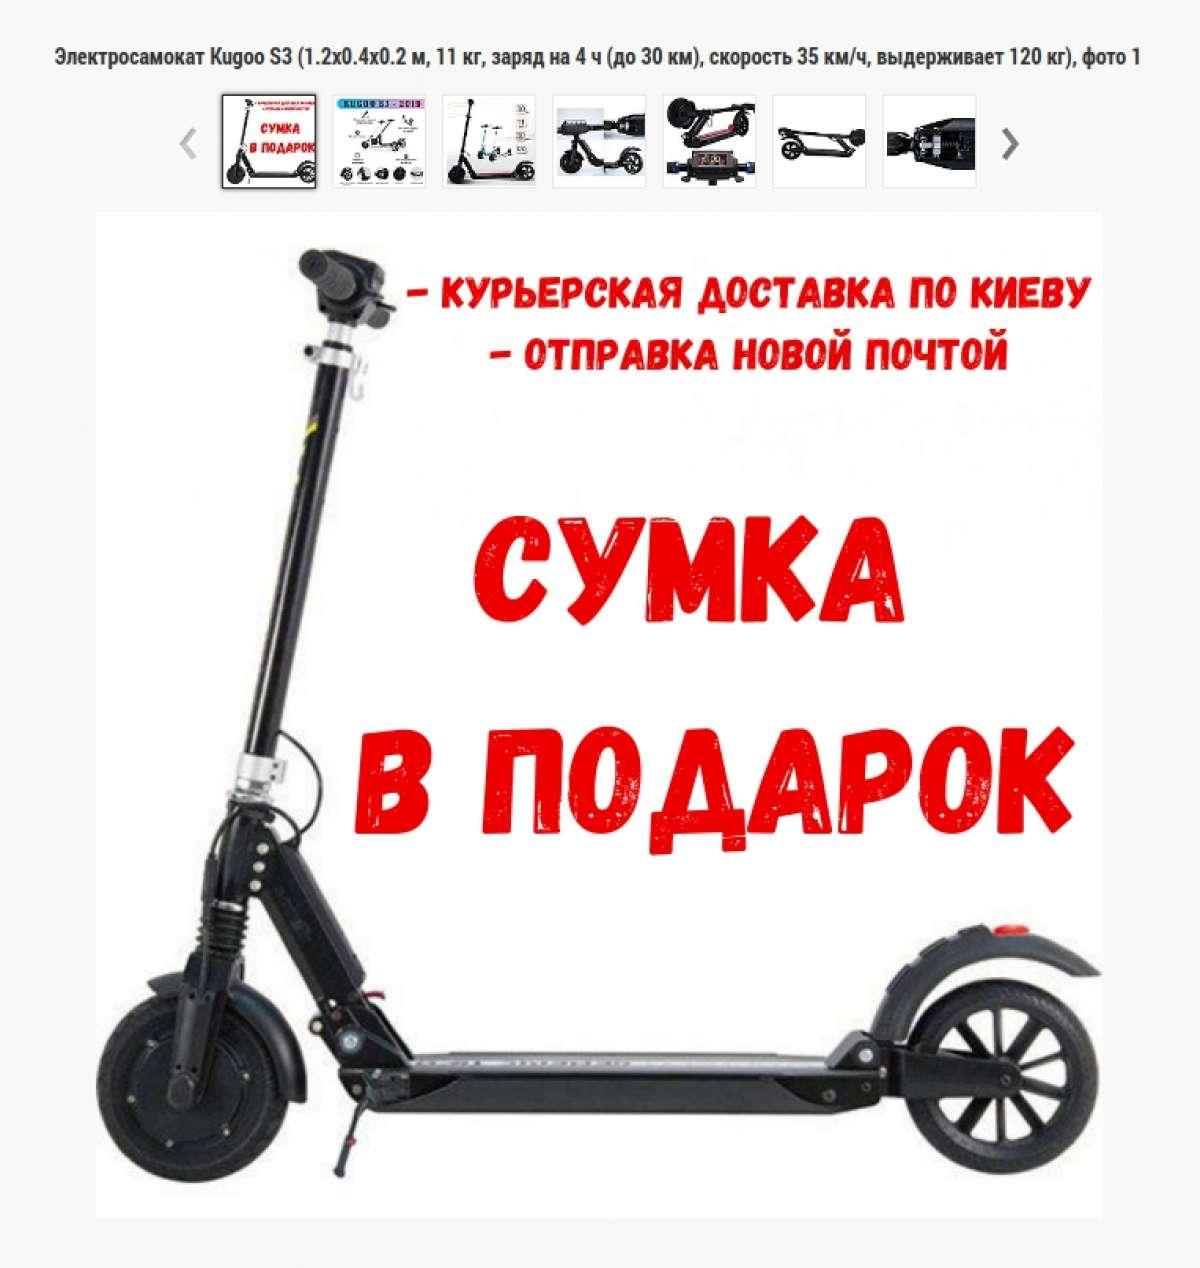 Электросамокат Kugoo S3 (вес 11 кг, пробег 30 км, 35 км/ч) + сумка